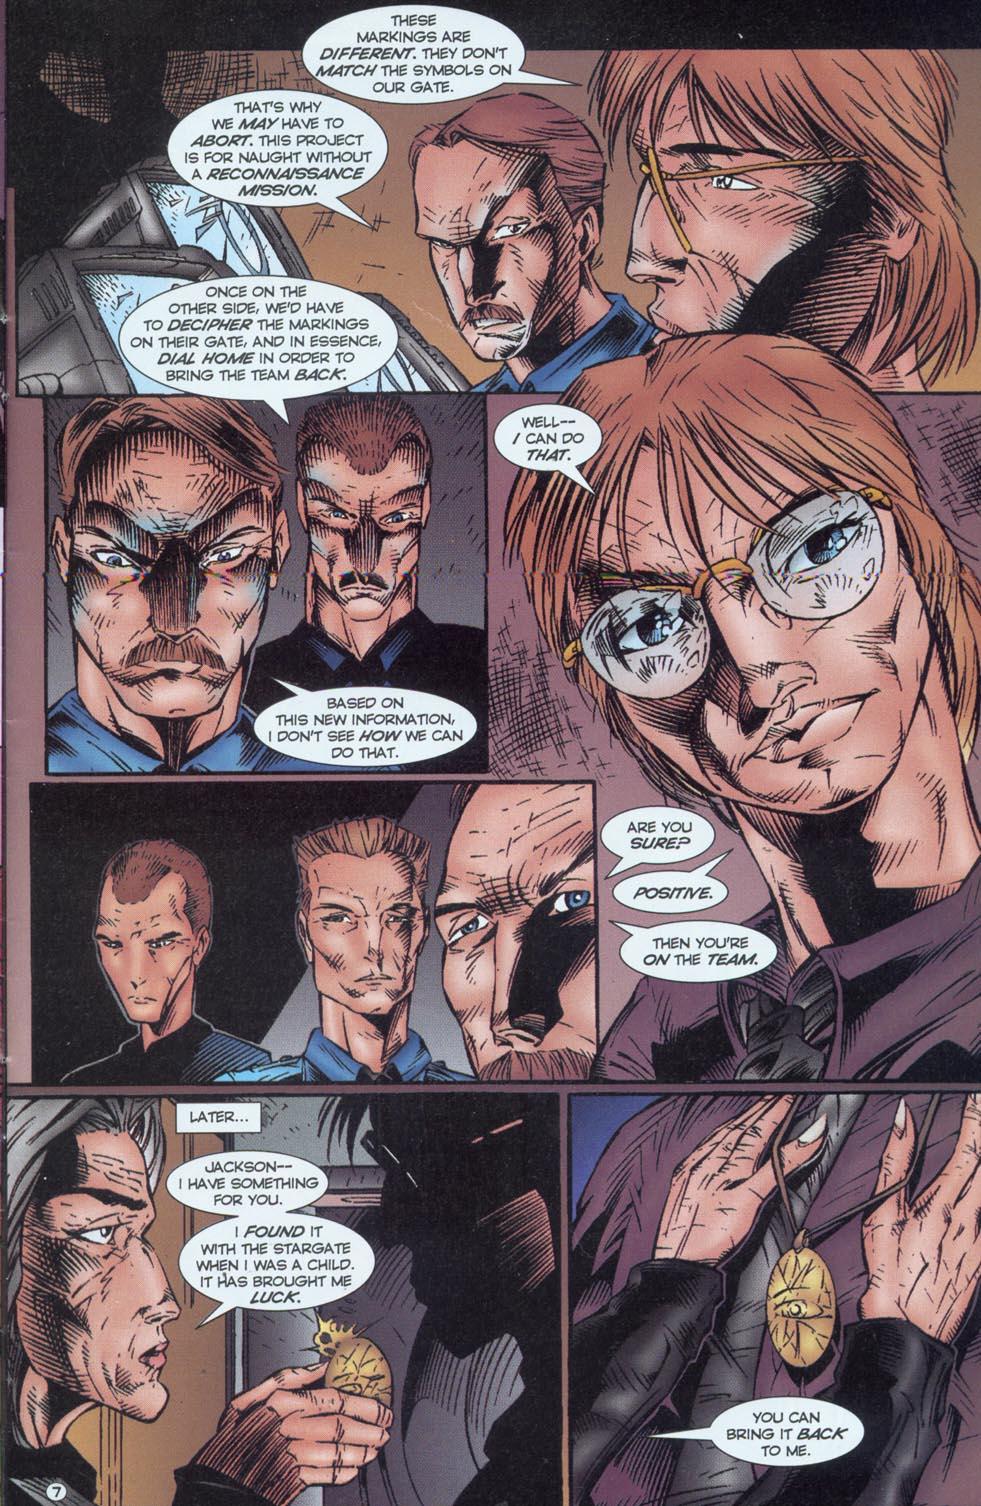 Read online Stargate comic -  Issue #1 - 9